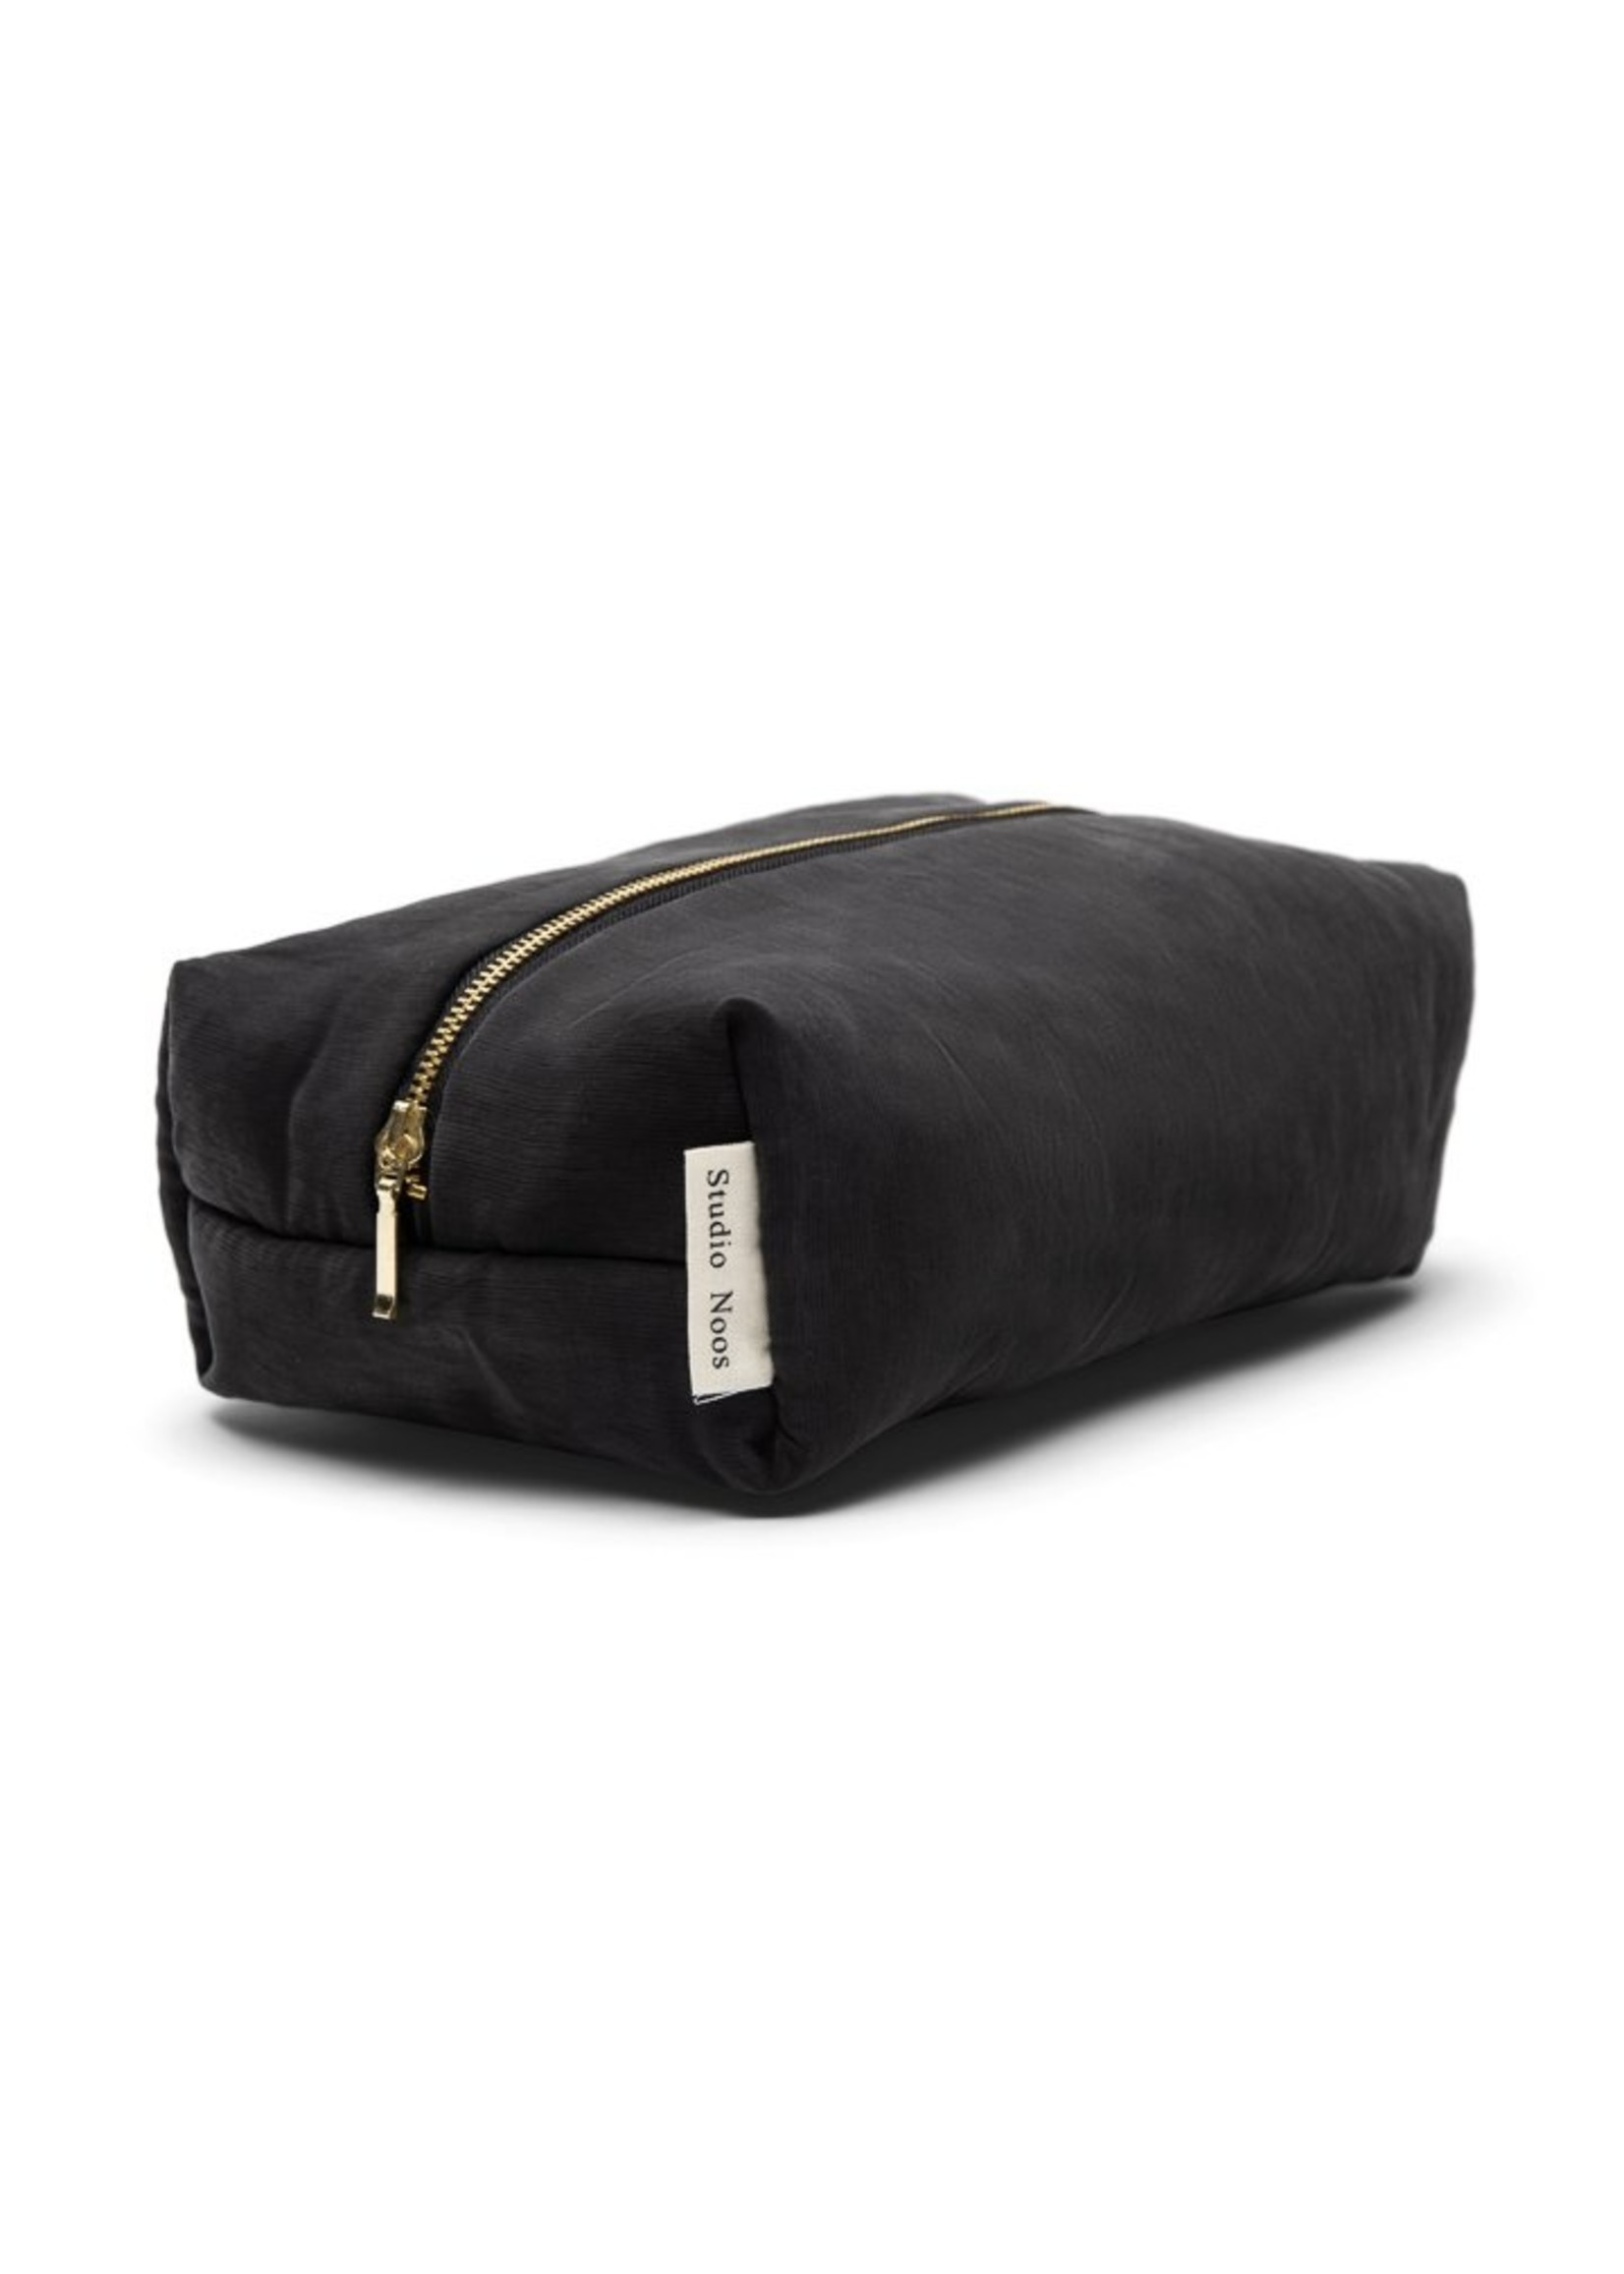 Studio Noos Puffed Pouch - Black